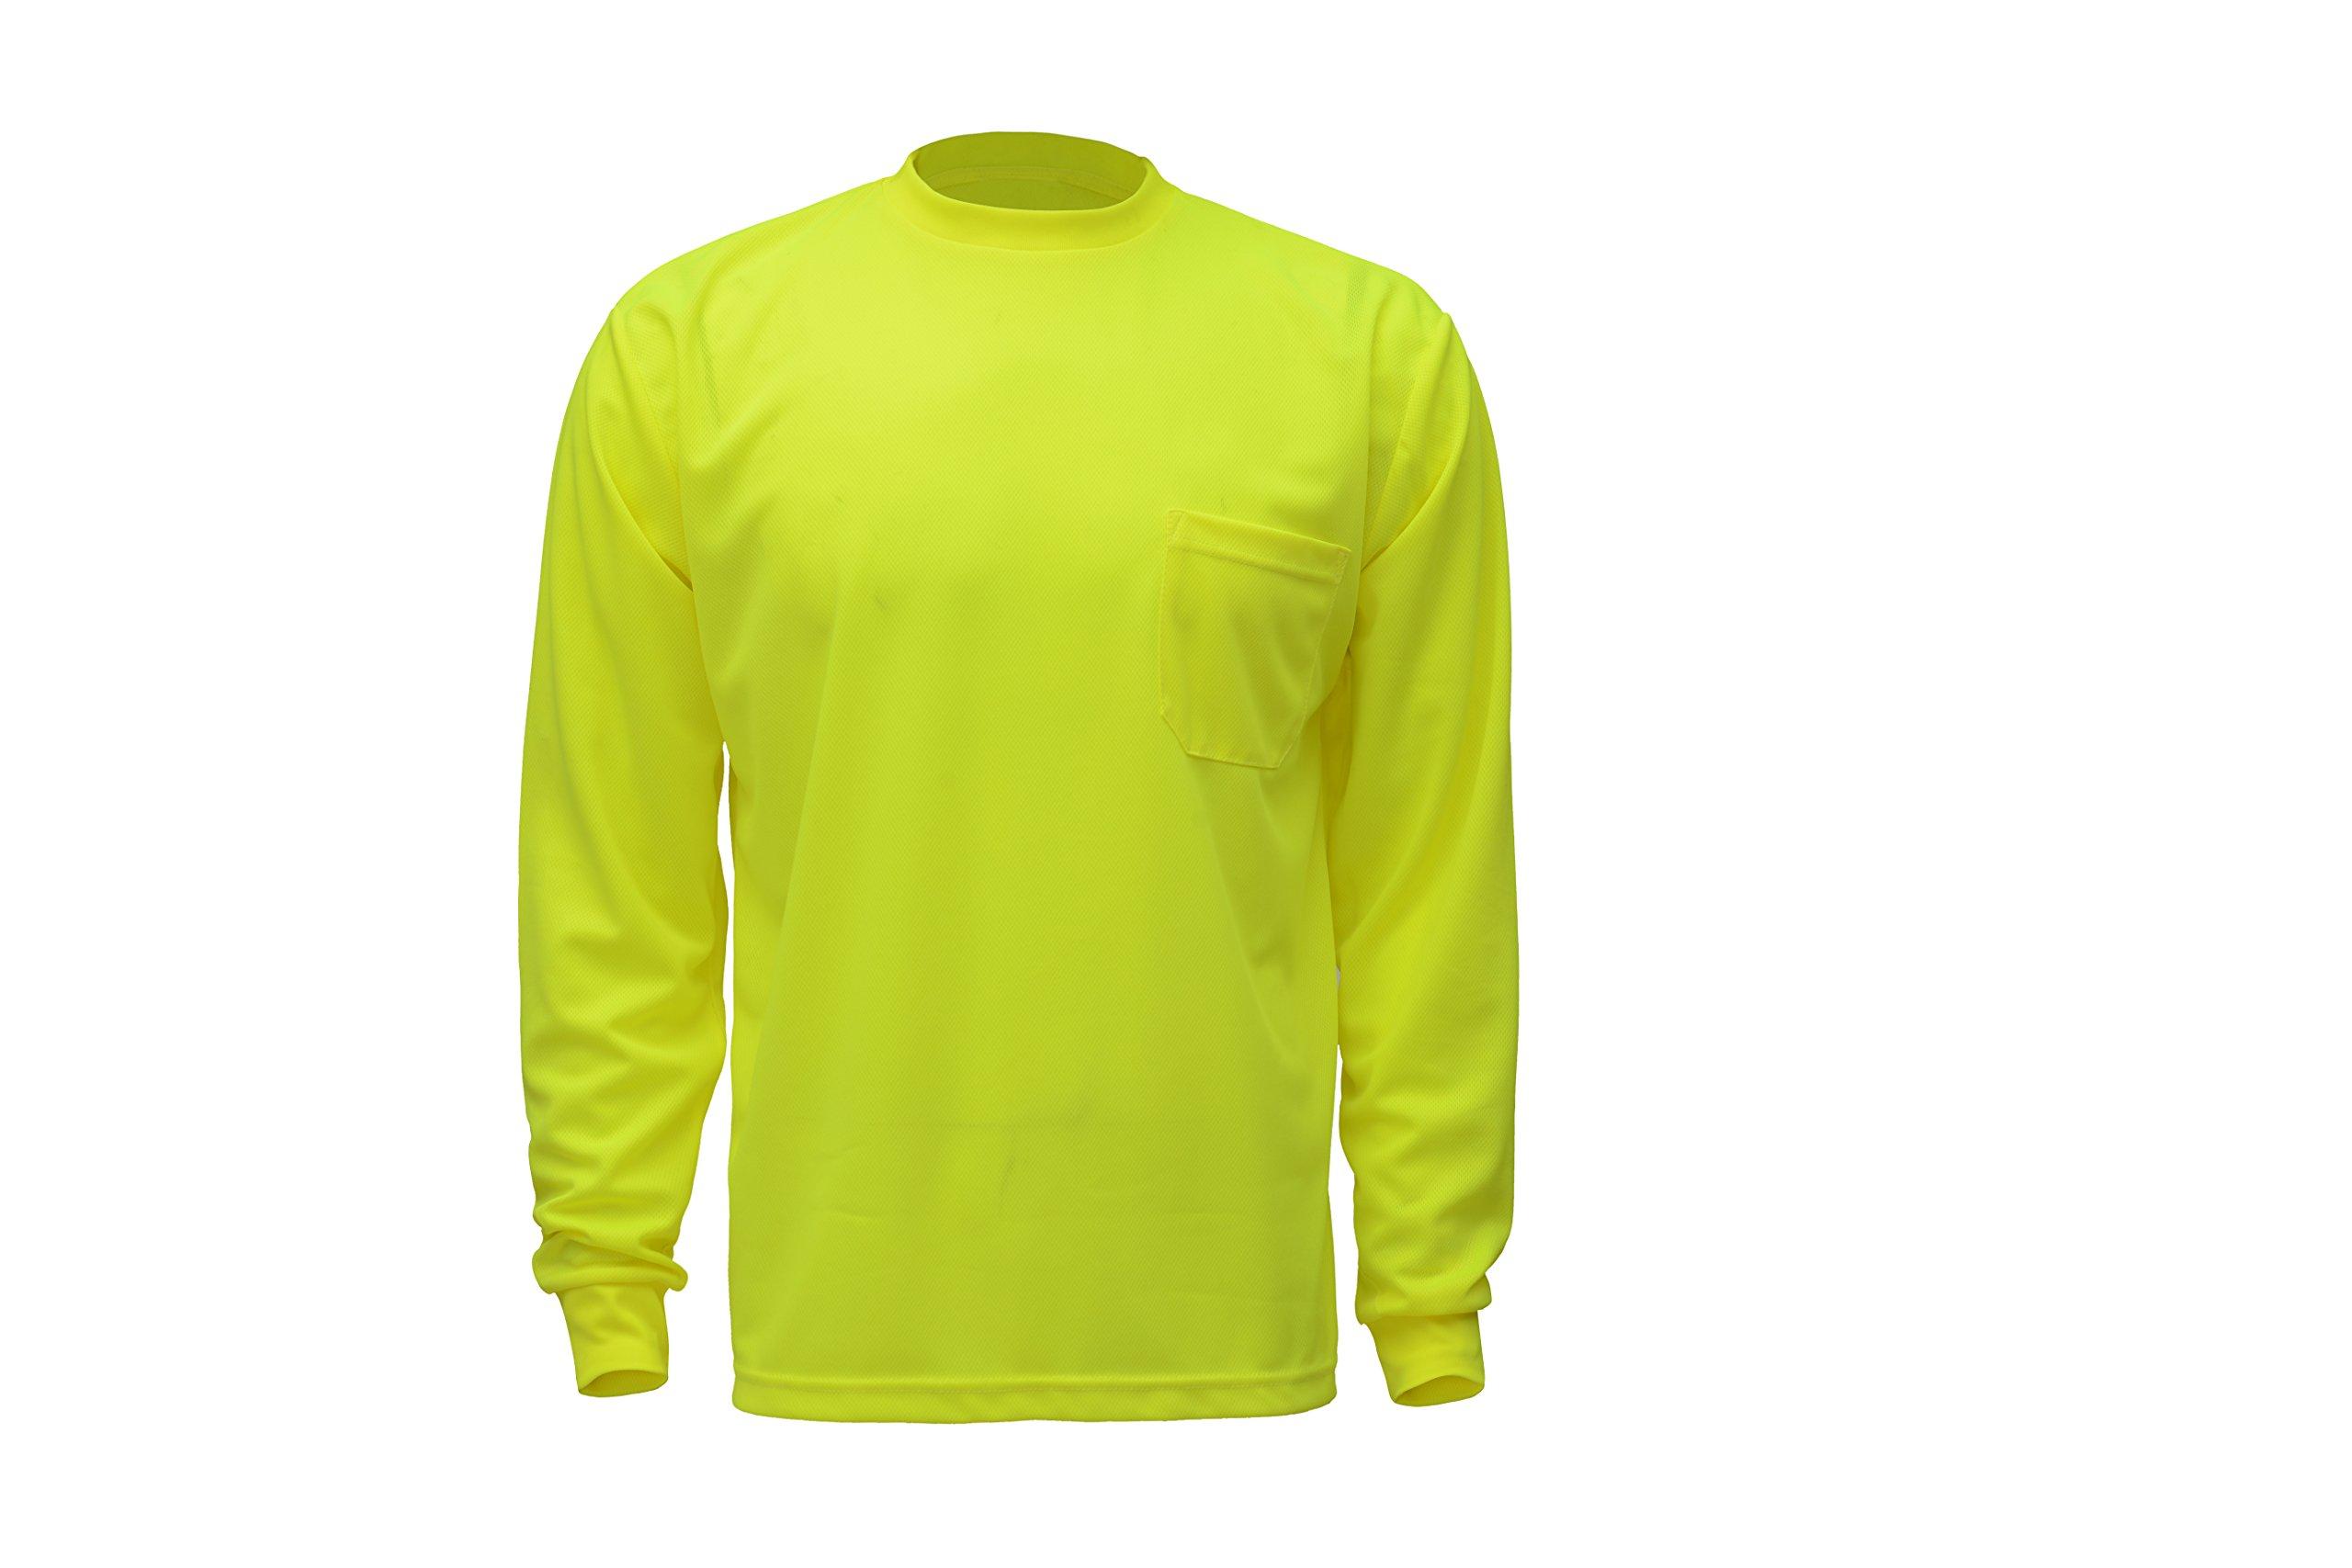 CJ Safety CJHVTS0002 High Vis Long Sleeve Safety Shirt | Moisture Wicking Birdseye Mesh | Chest Pocket (2XL, Green)